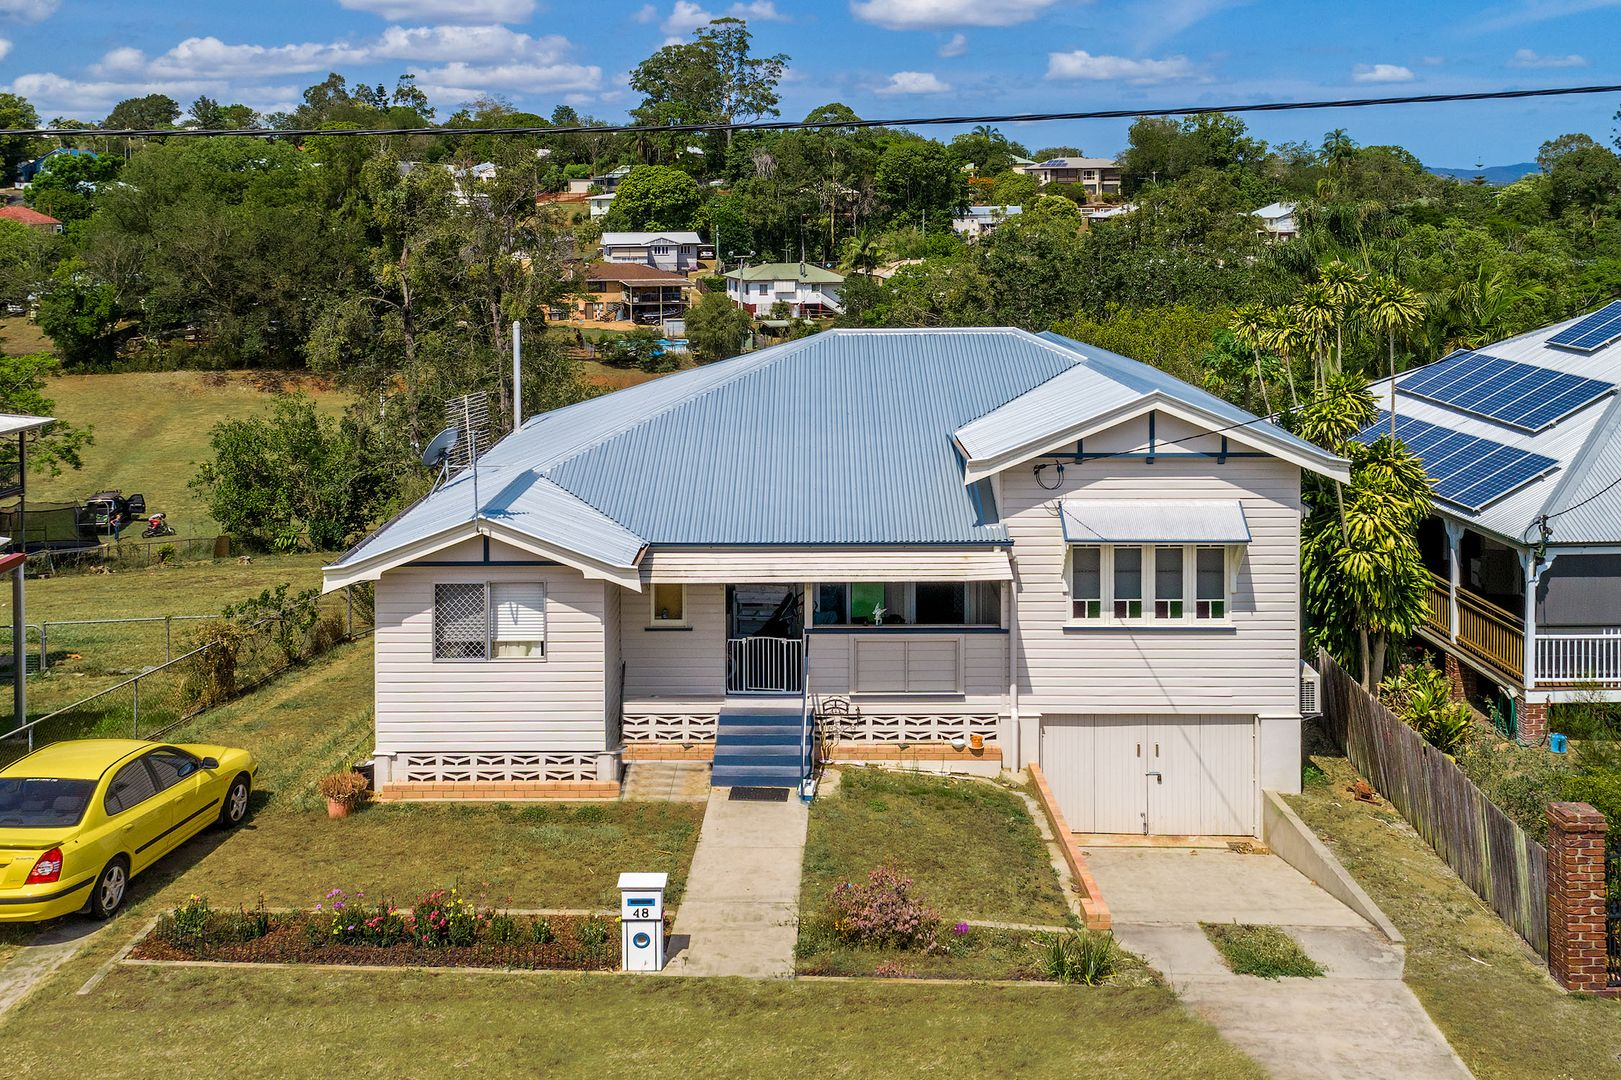 48 Hilton Road, Gympie QLD 4570, Image 0